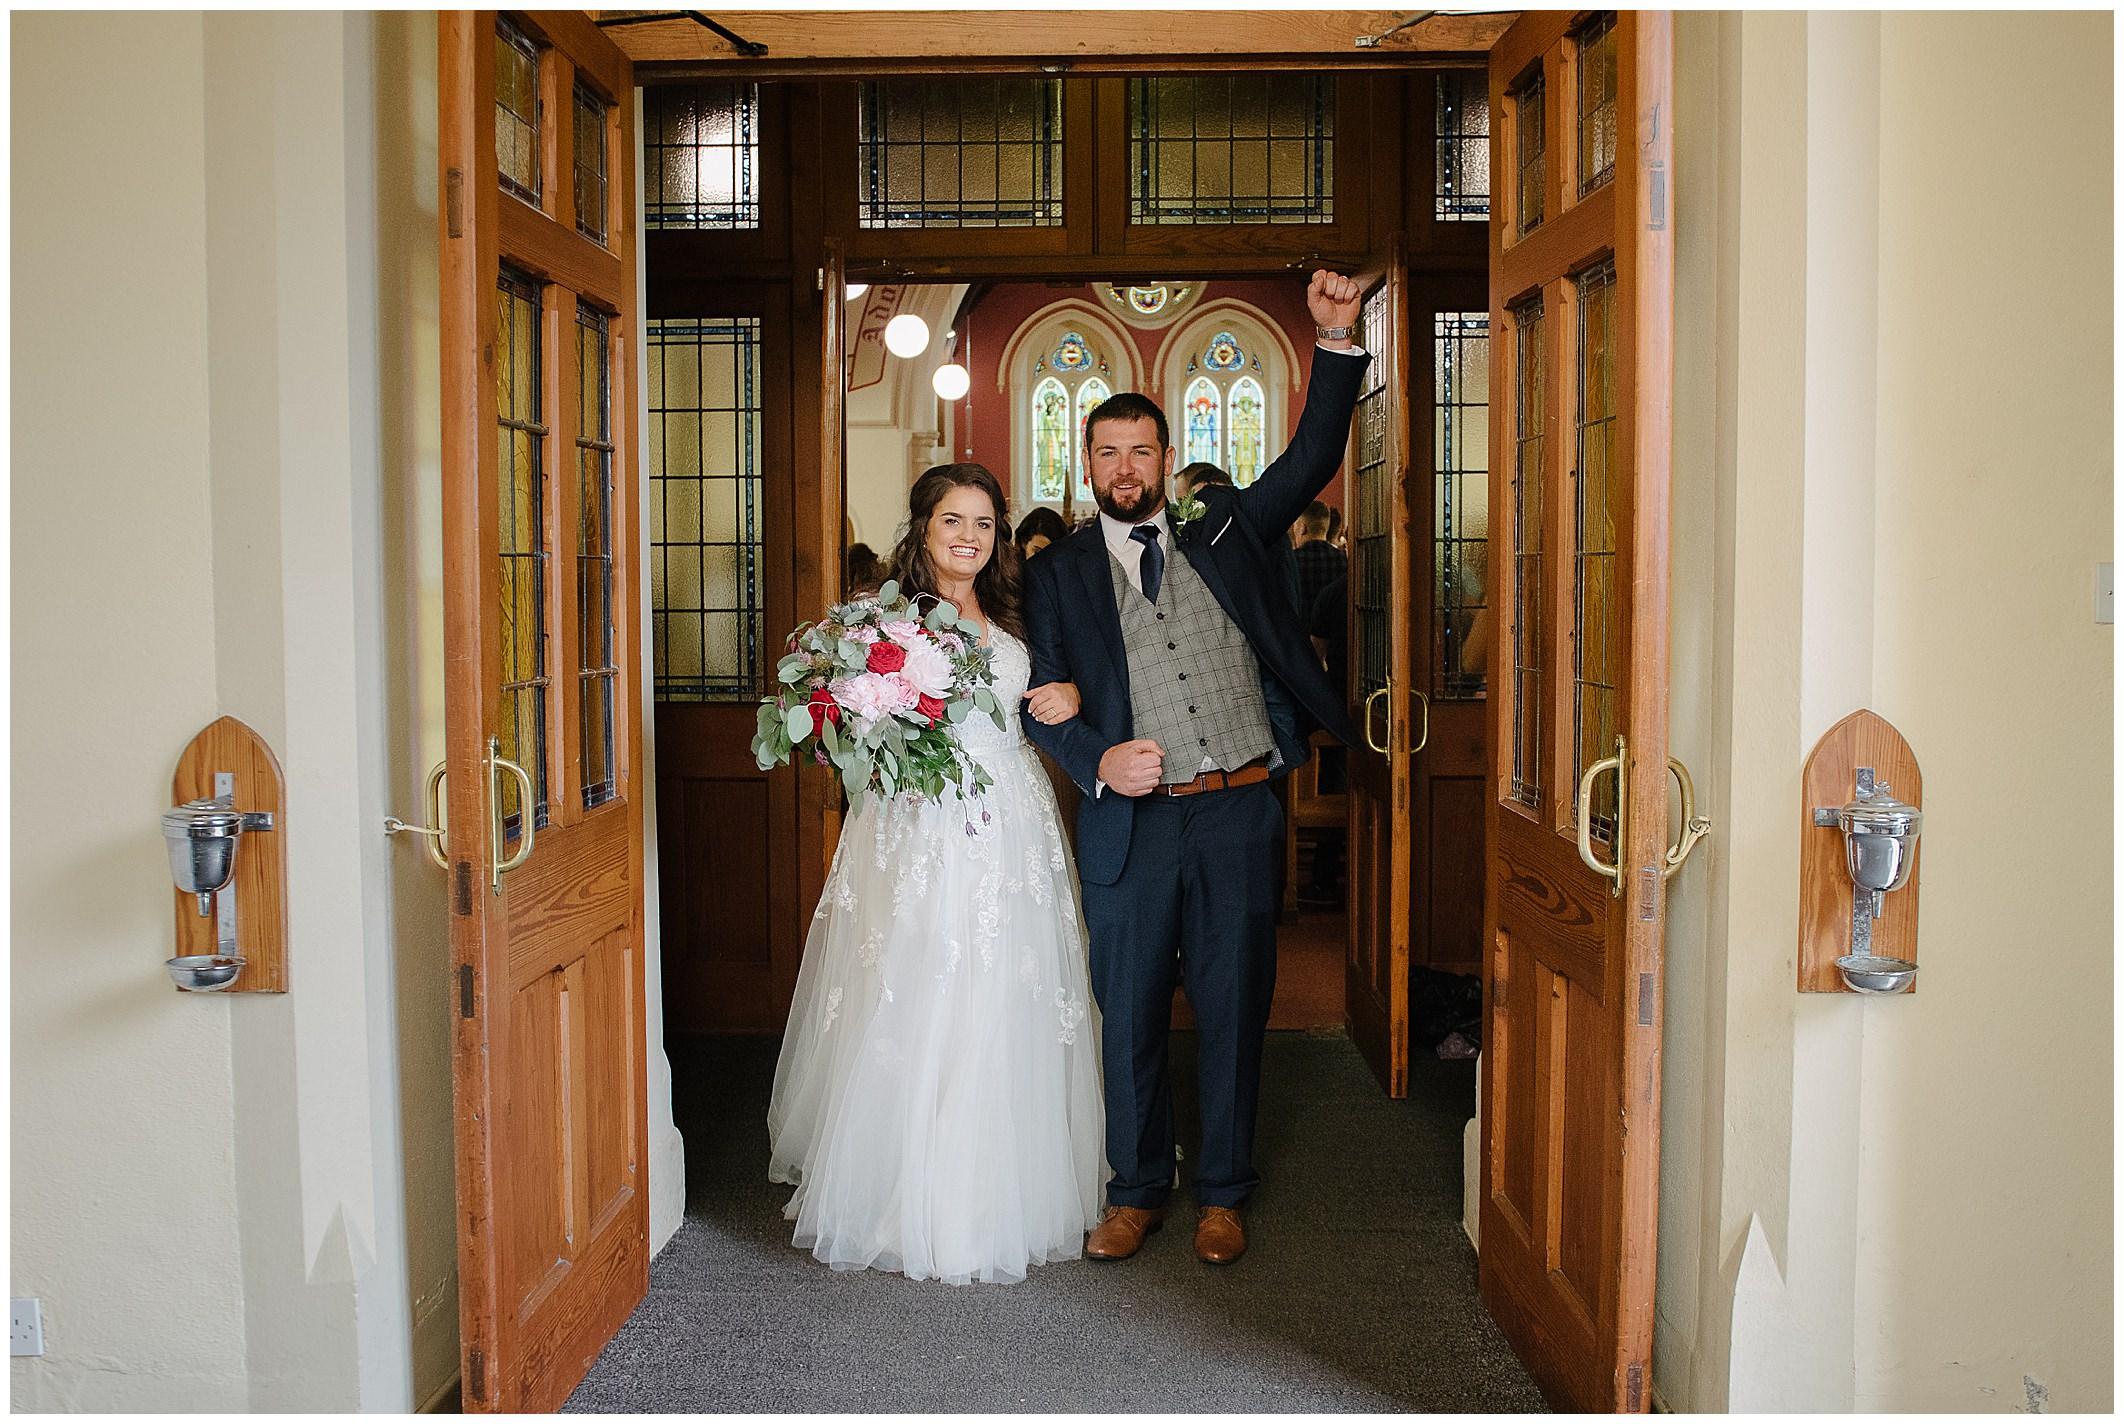 redcastle-hotel-wedding-karen-brian-jude-browne-photography-078.jpg